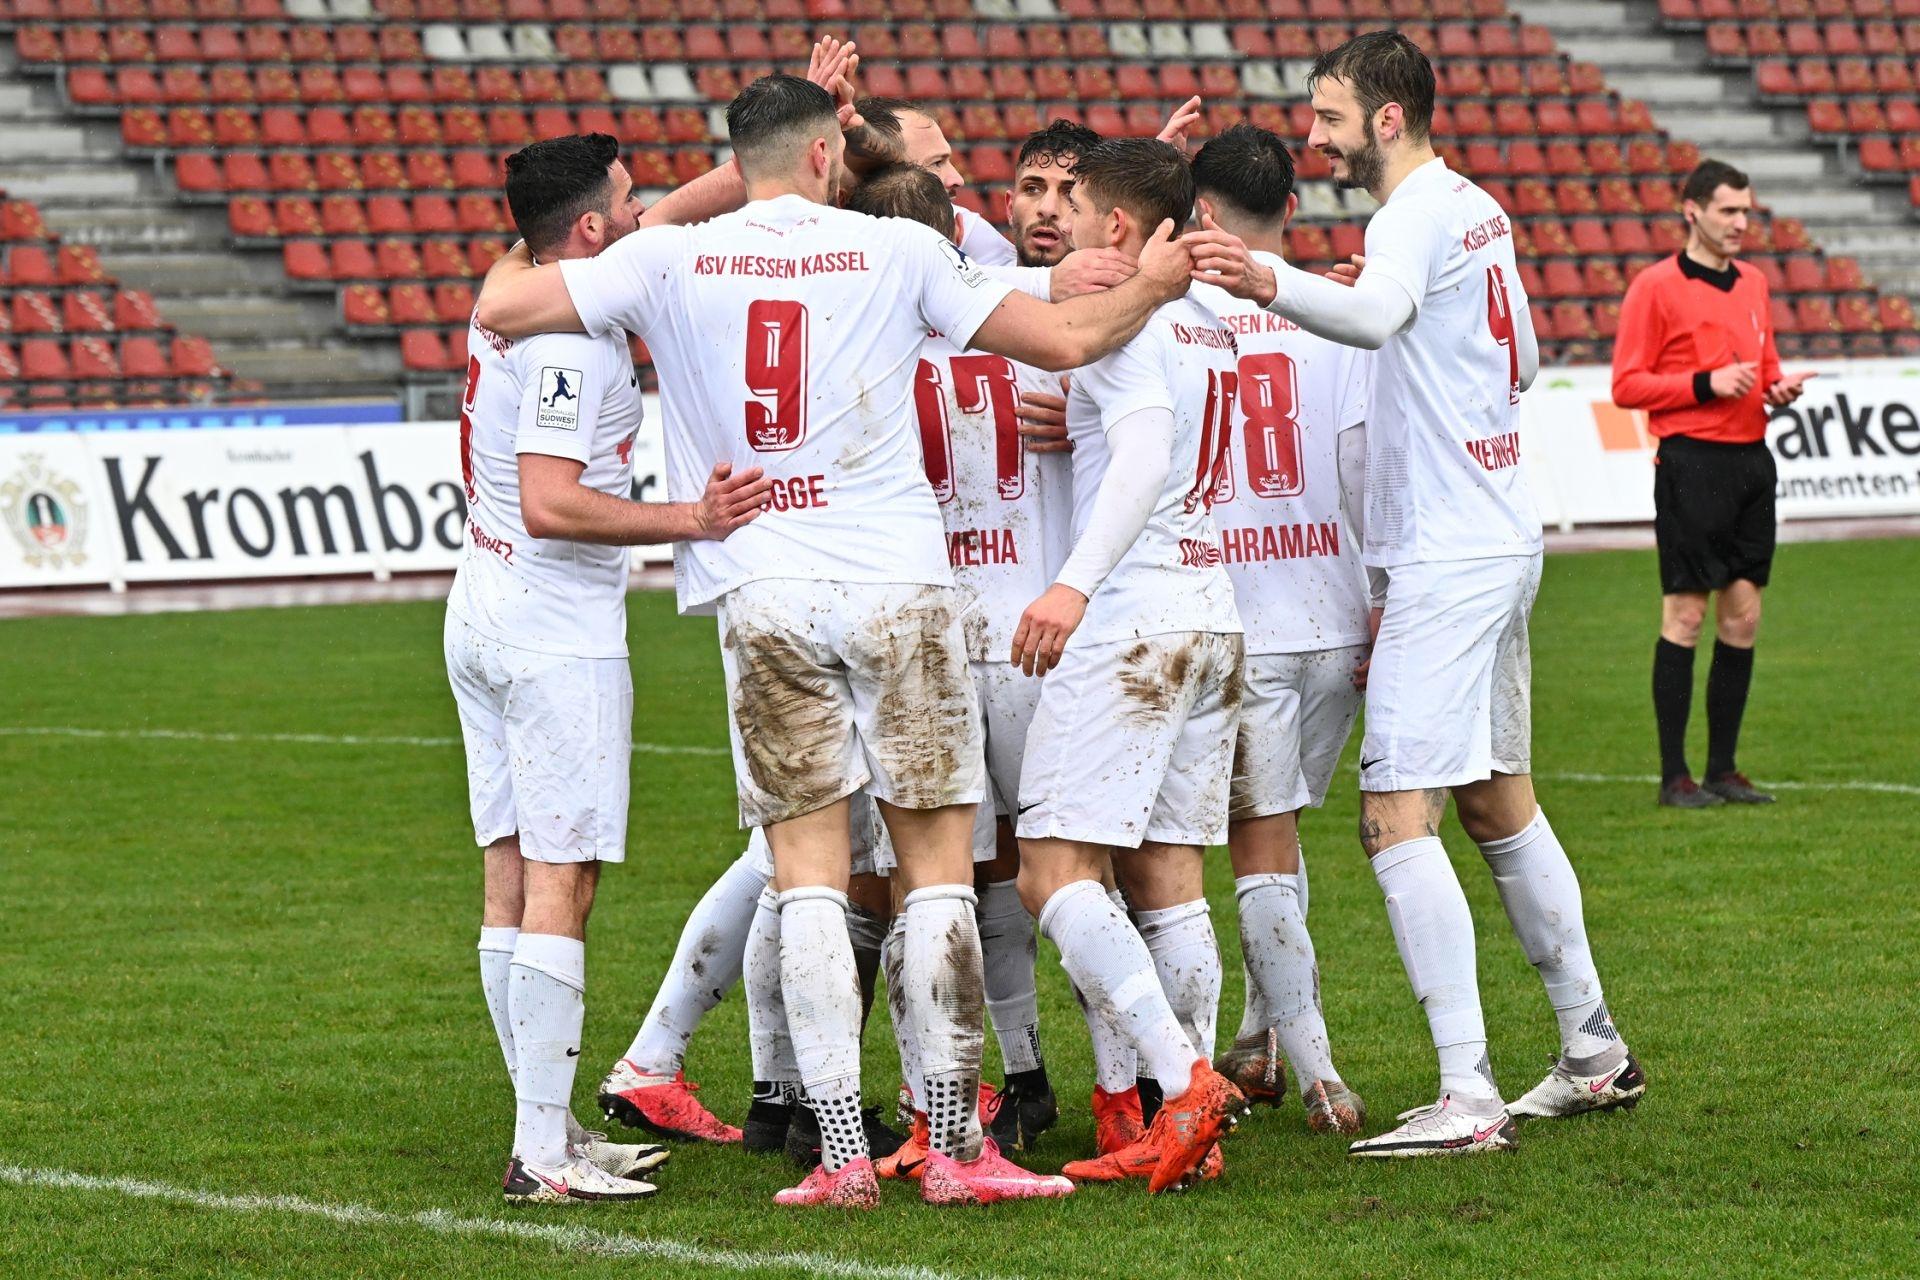 Regionalliga S�dwest 2020/21, KSV Hessen Kassel, FSV Frankfurt, Endstand 2:1, Jubel zum 2:0